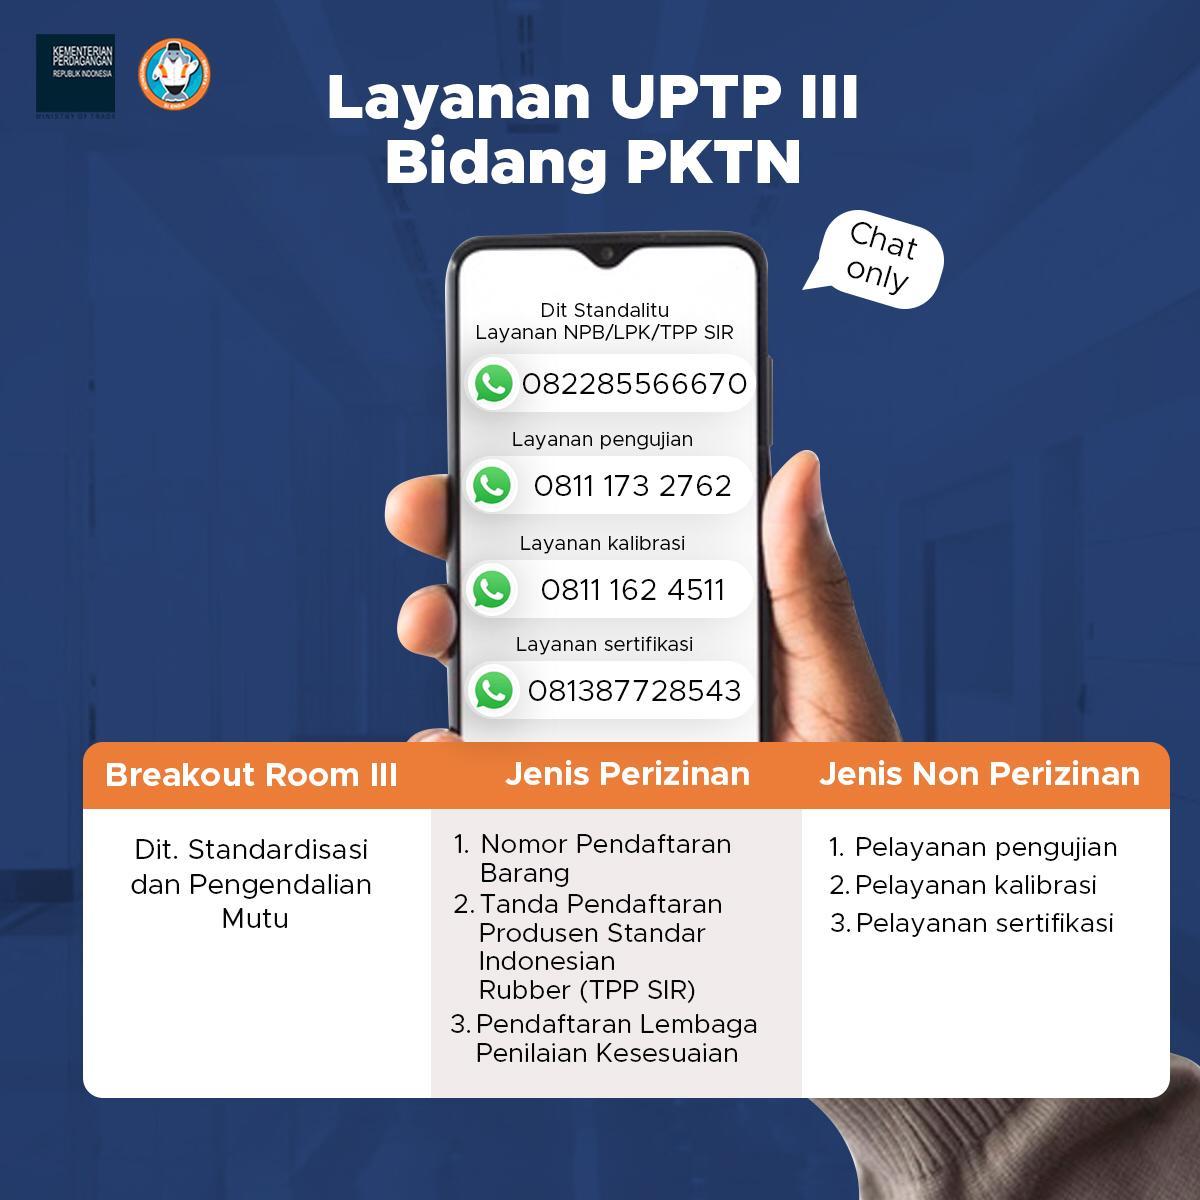 Layanan UPTP III Bidang PKTN